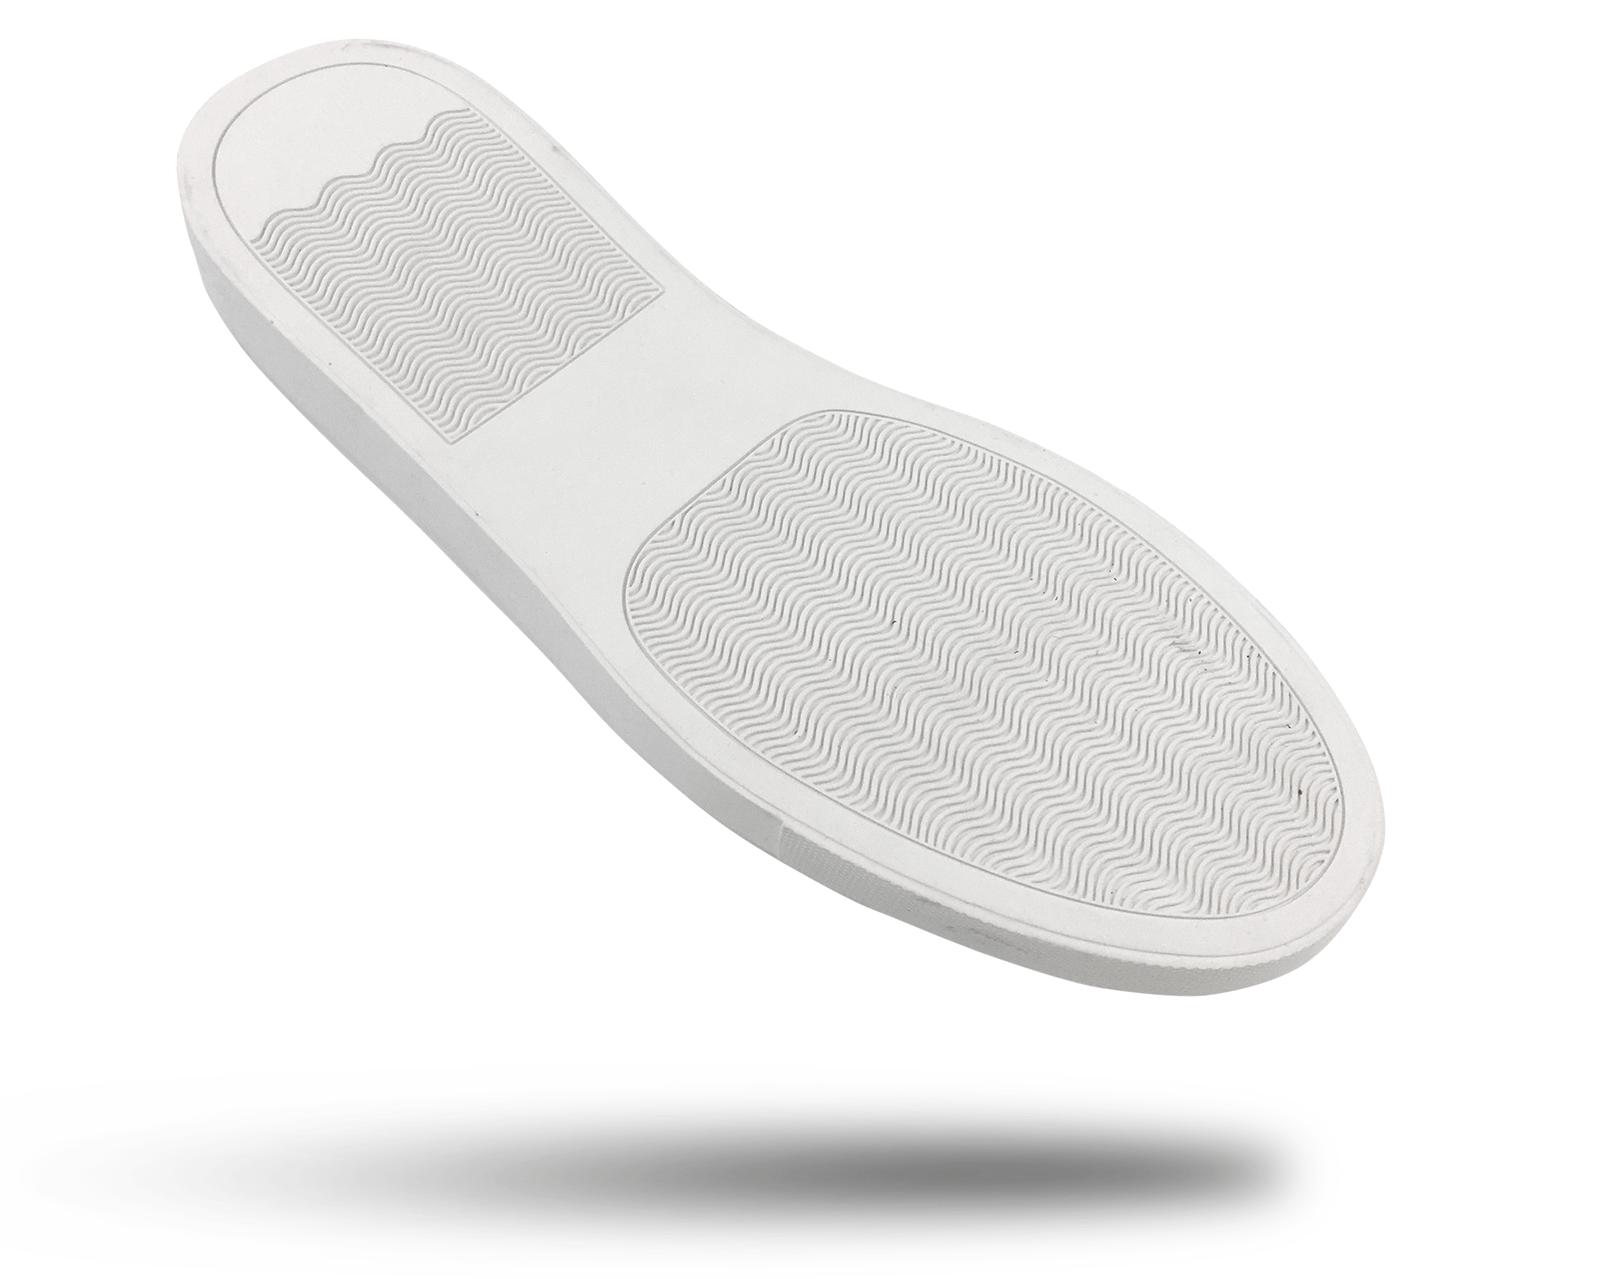 Rubber shoe outsole